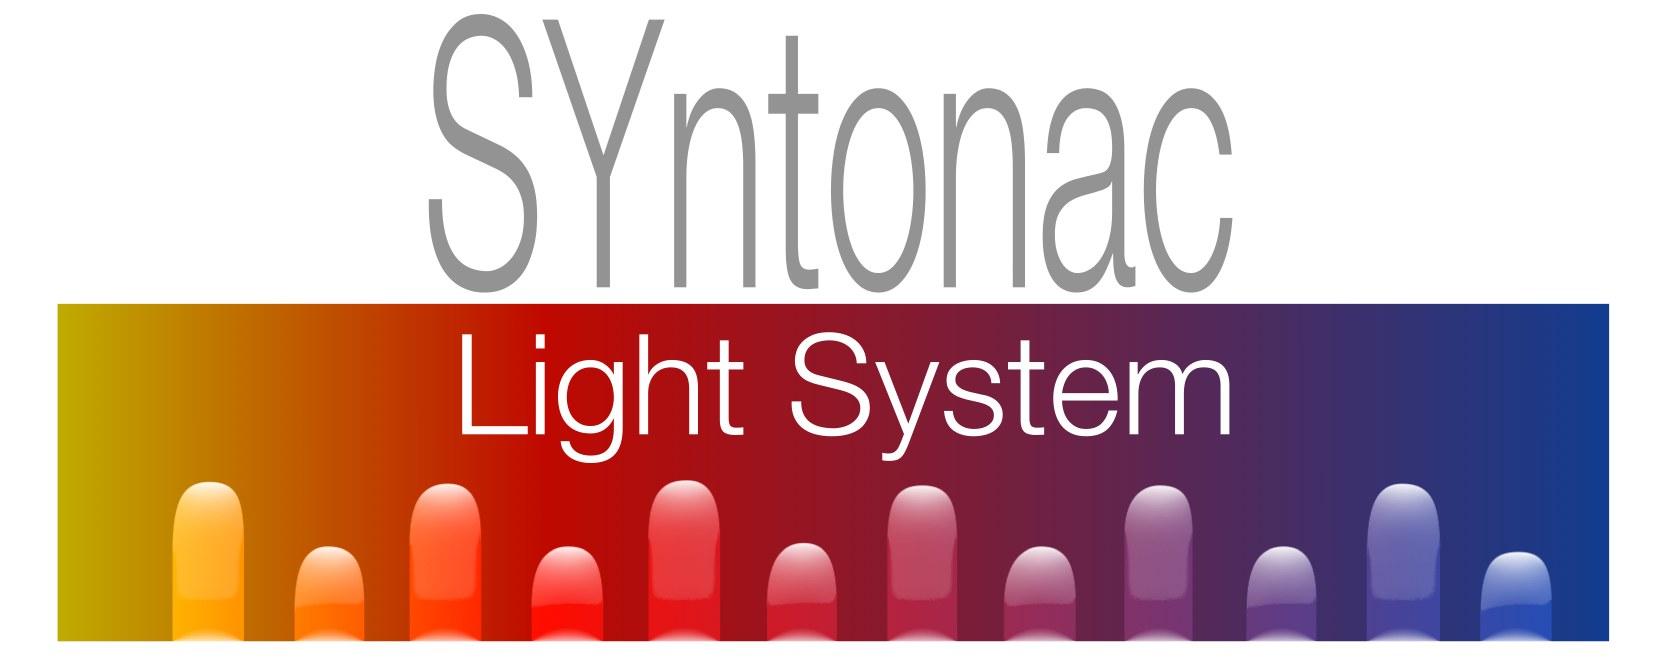 SYntonac1.1.2.jpg